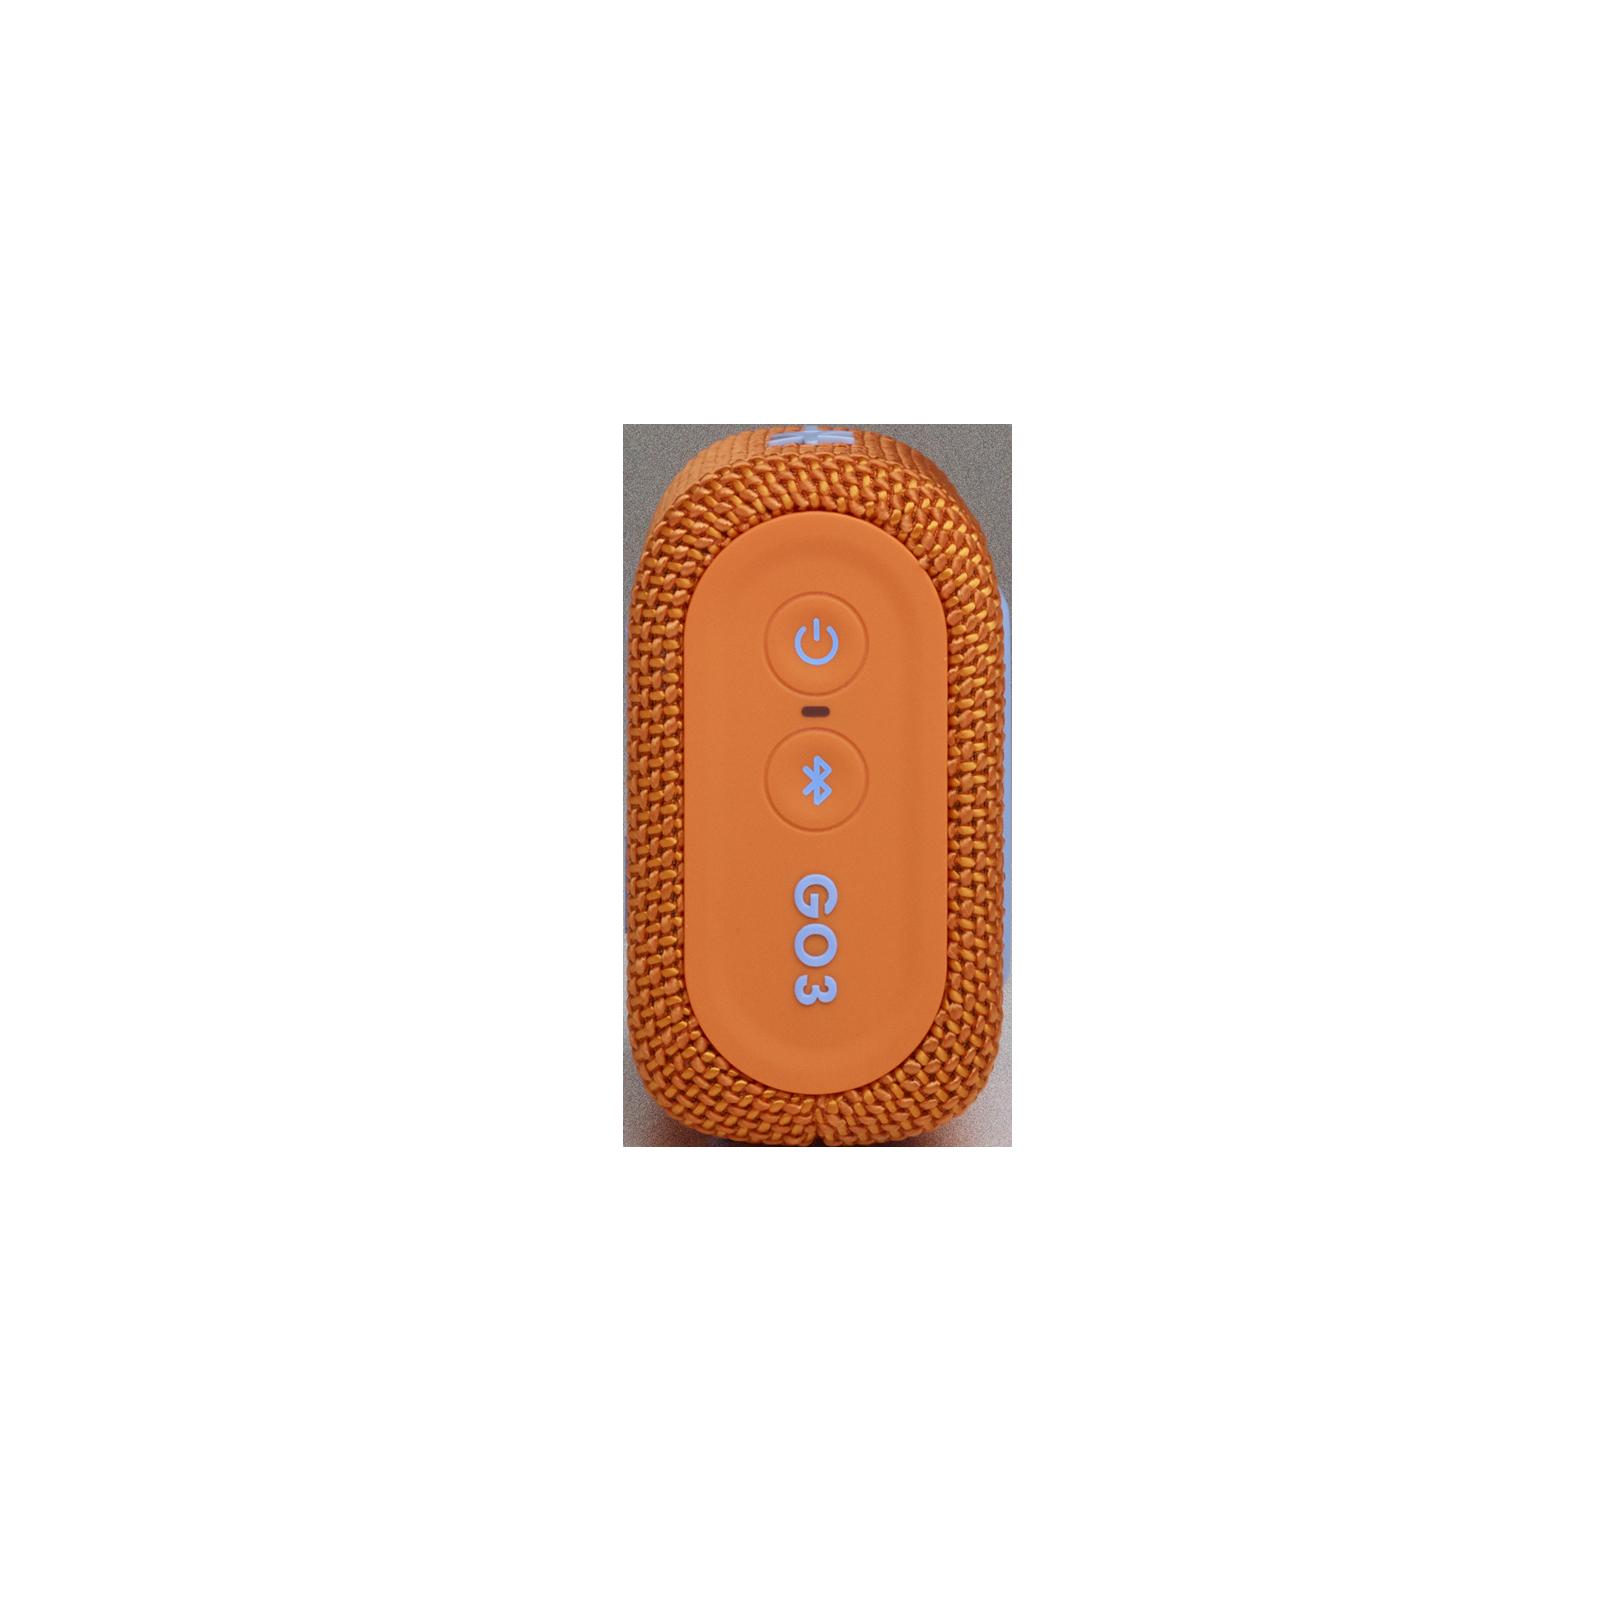 JBL GO 3 - Orange - Portable Waterproof Speaker - Right